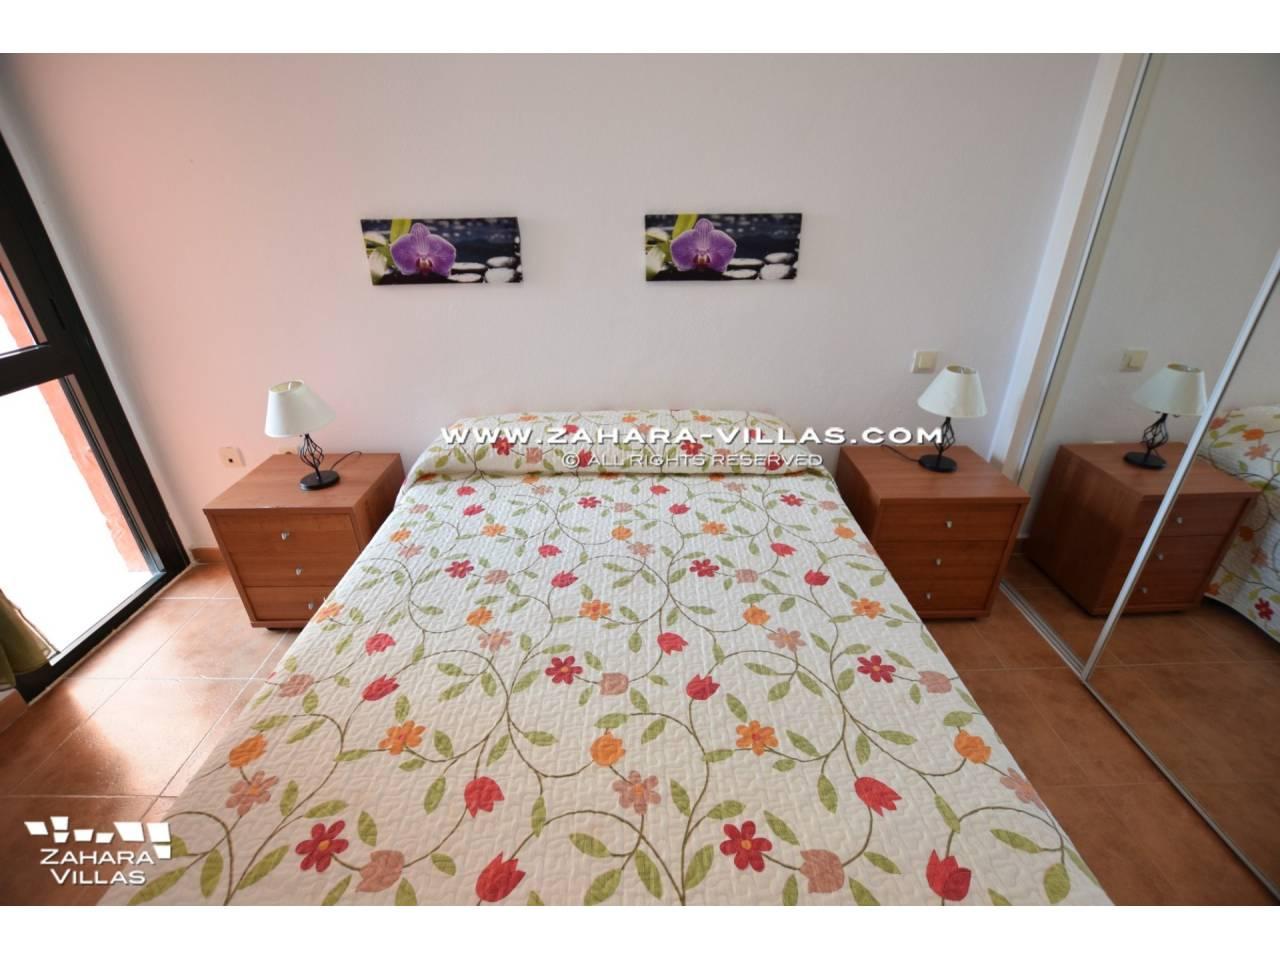 Imagen 19 de Penthouse for sale in Zahara de los Atunes